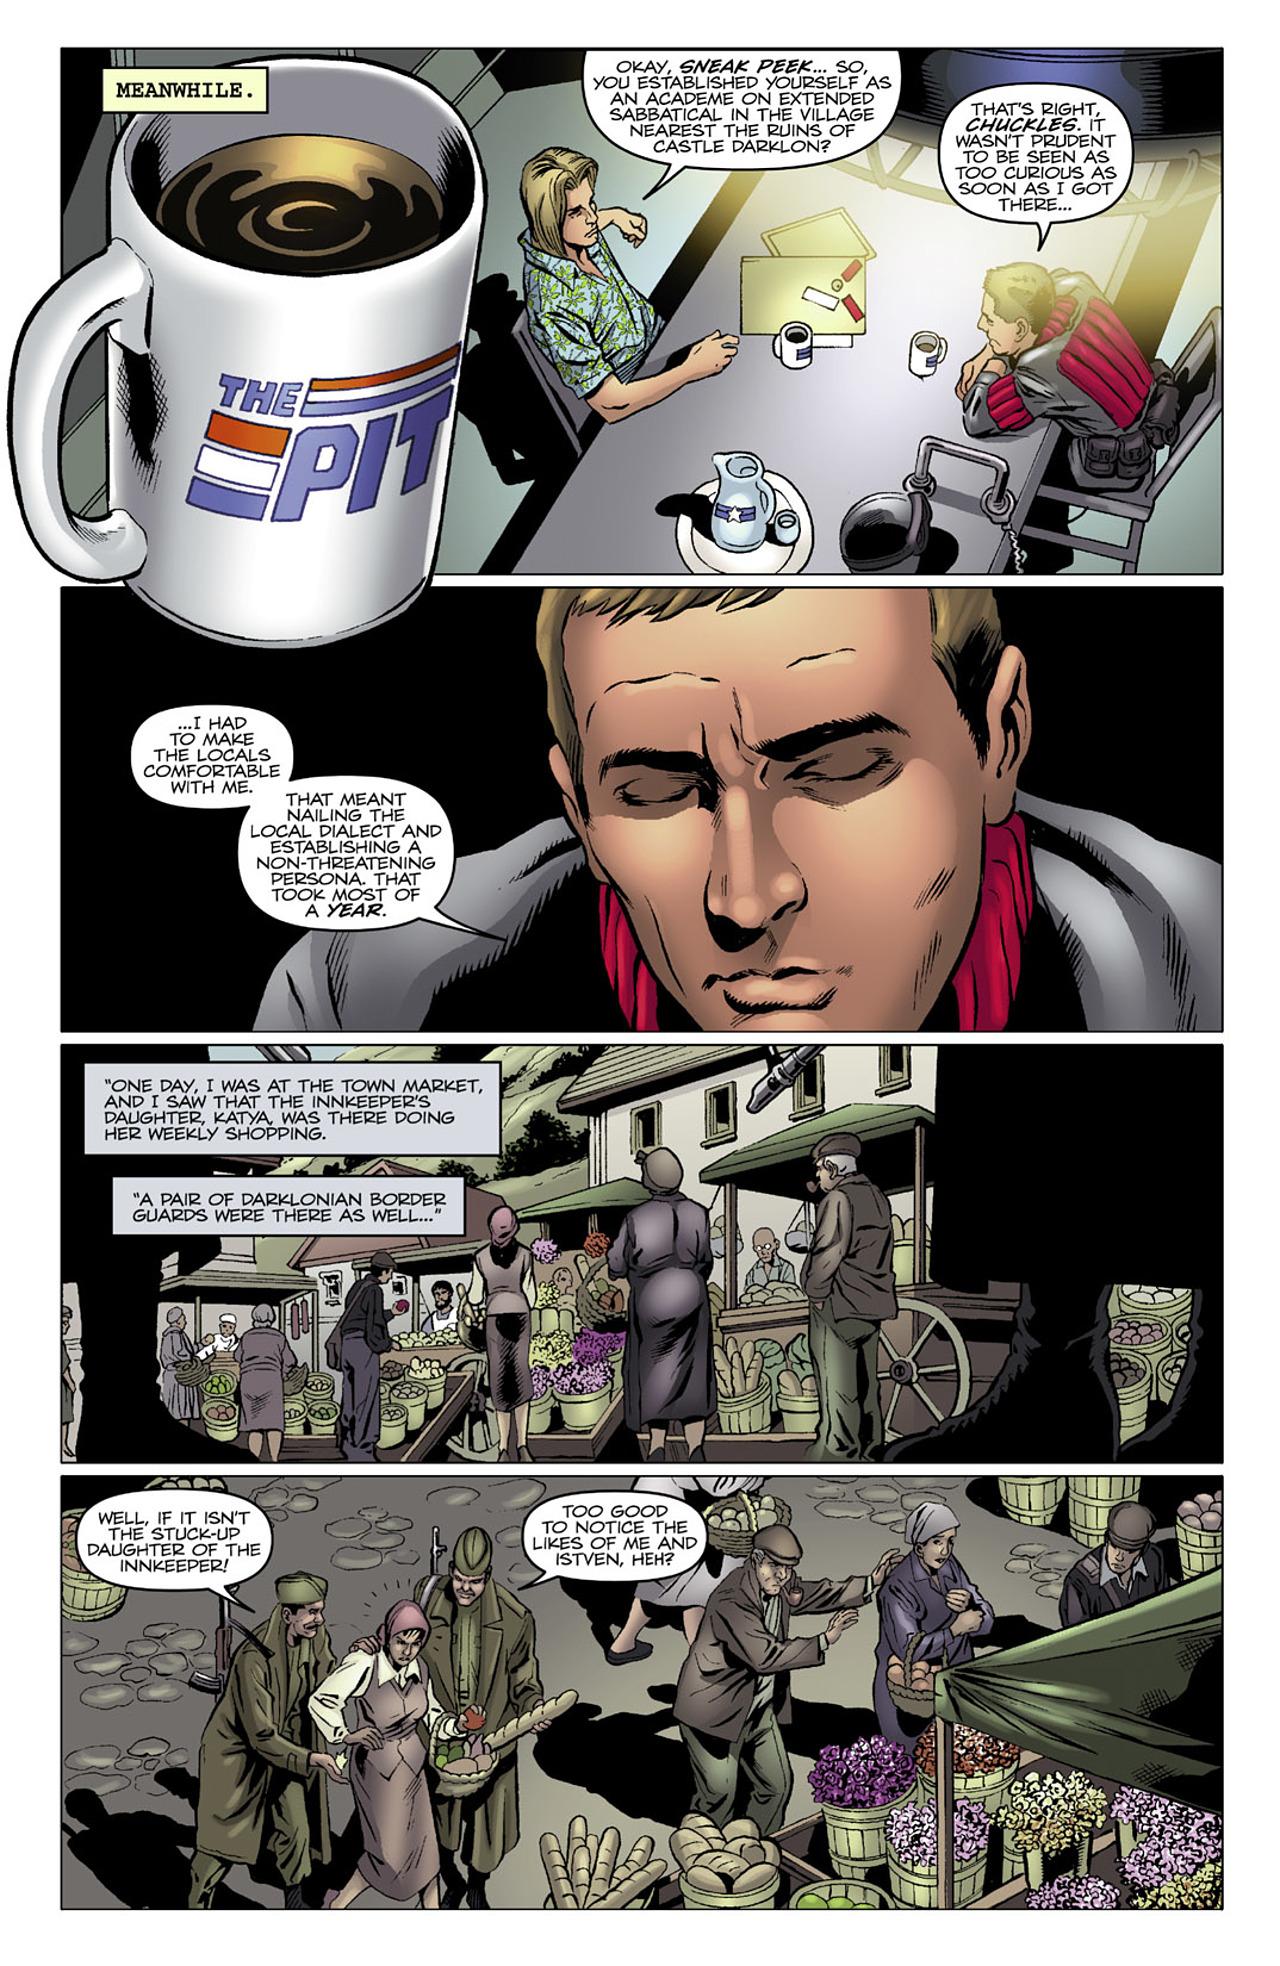 G.I. Joe: A Real American Hero 170 Page 14